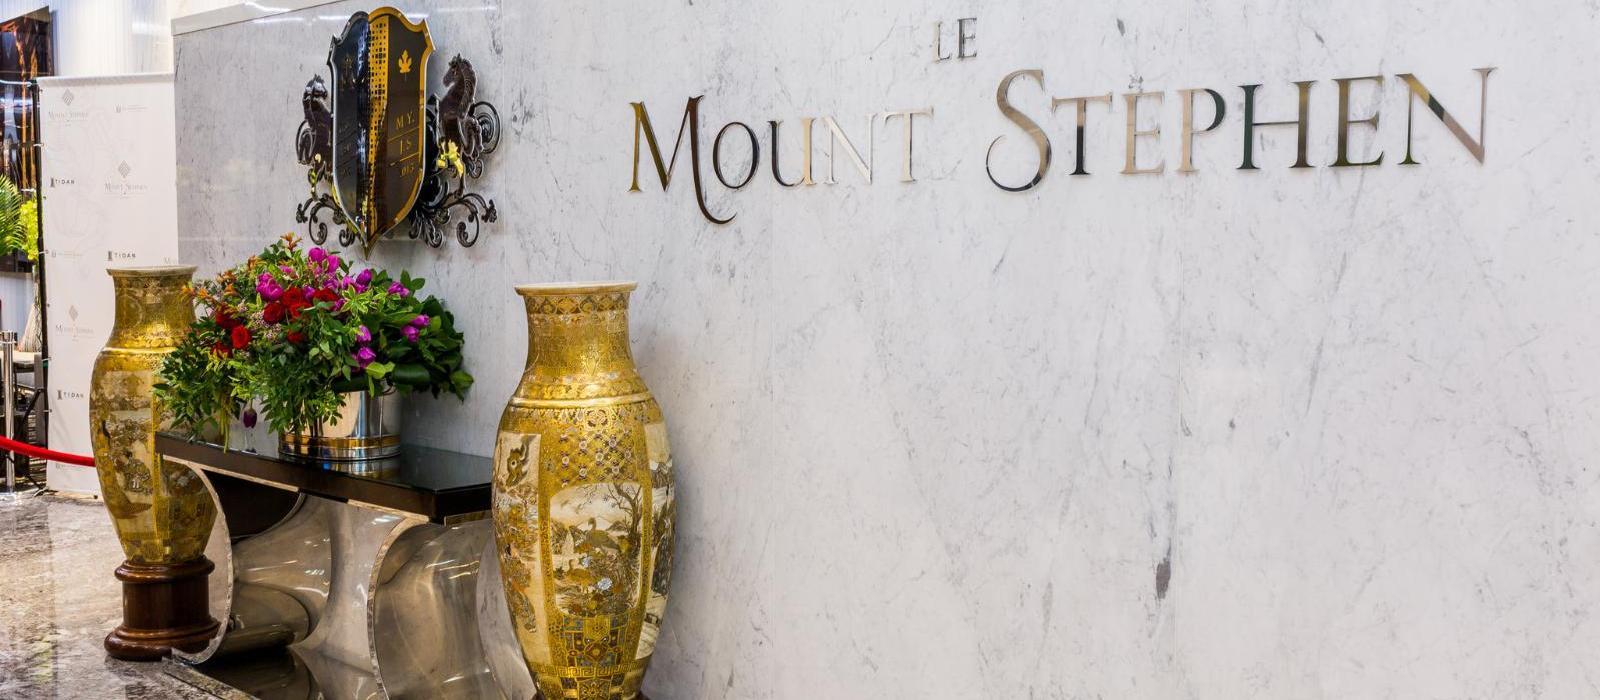 芒特斯蒂芬酒店(Le Mount Stephen) 图片  www.lhw.cn